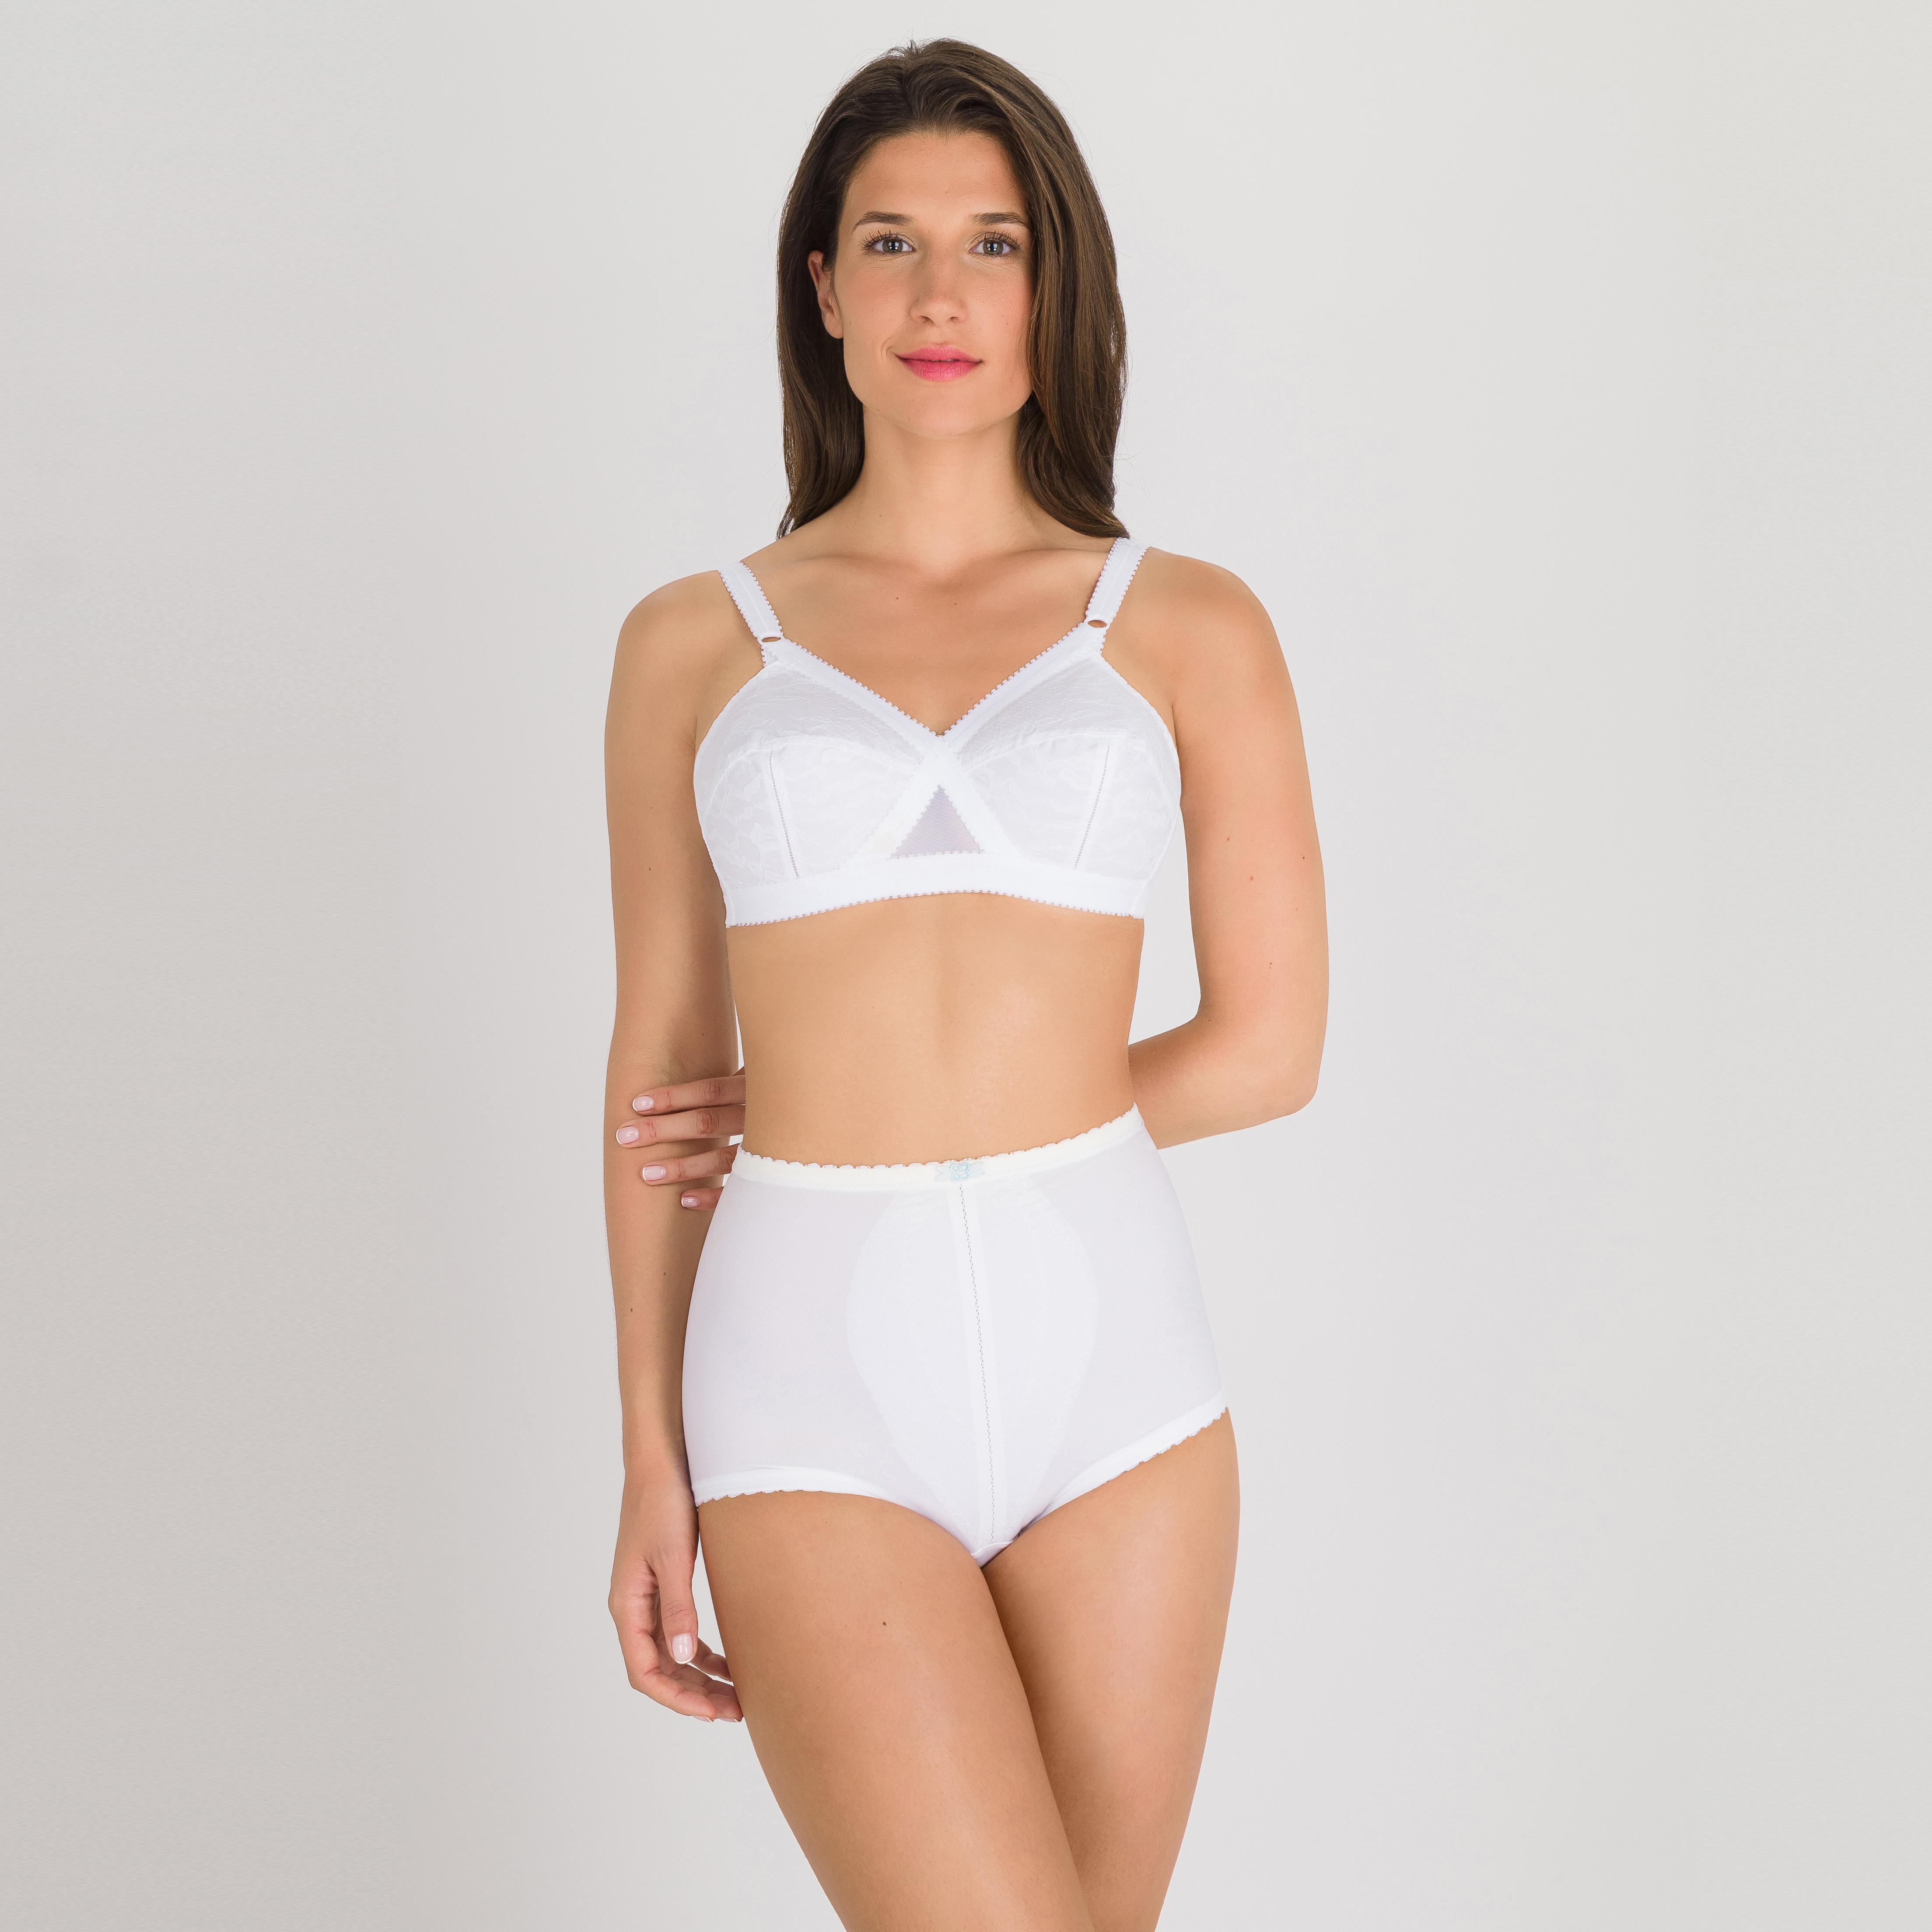 Braga corpiño moldeadora blanca - ICBIAG, , PLAYTEX